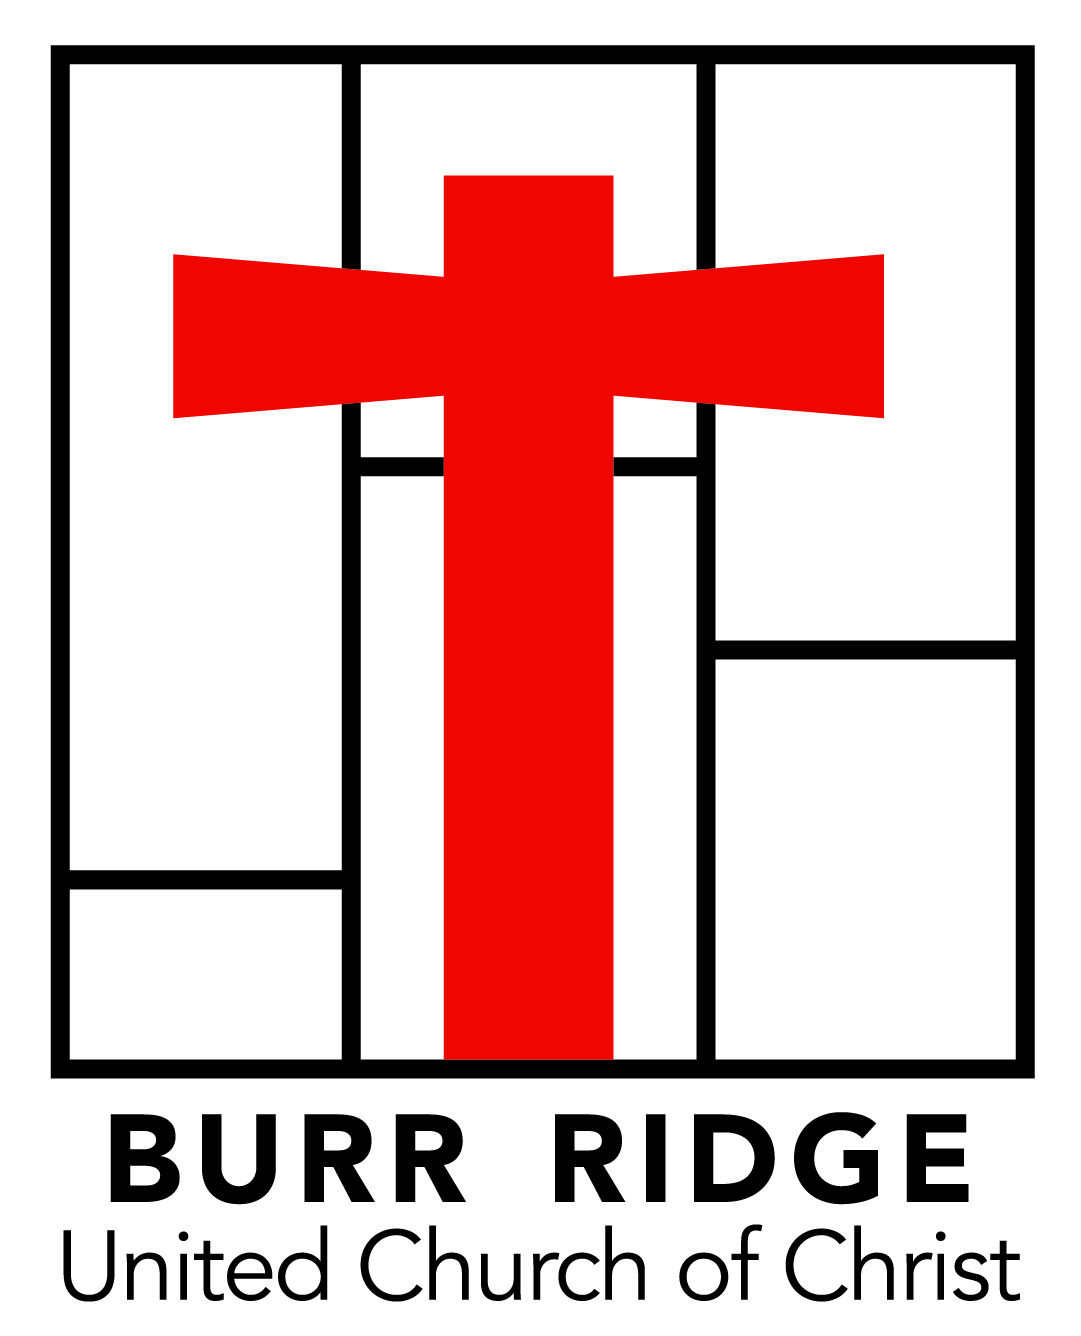 Burr Ridge United Church of Christ